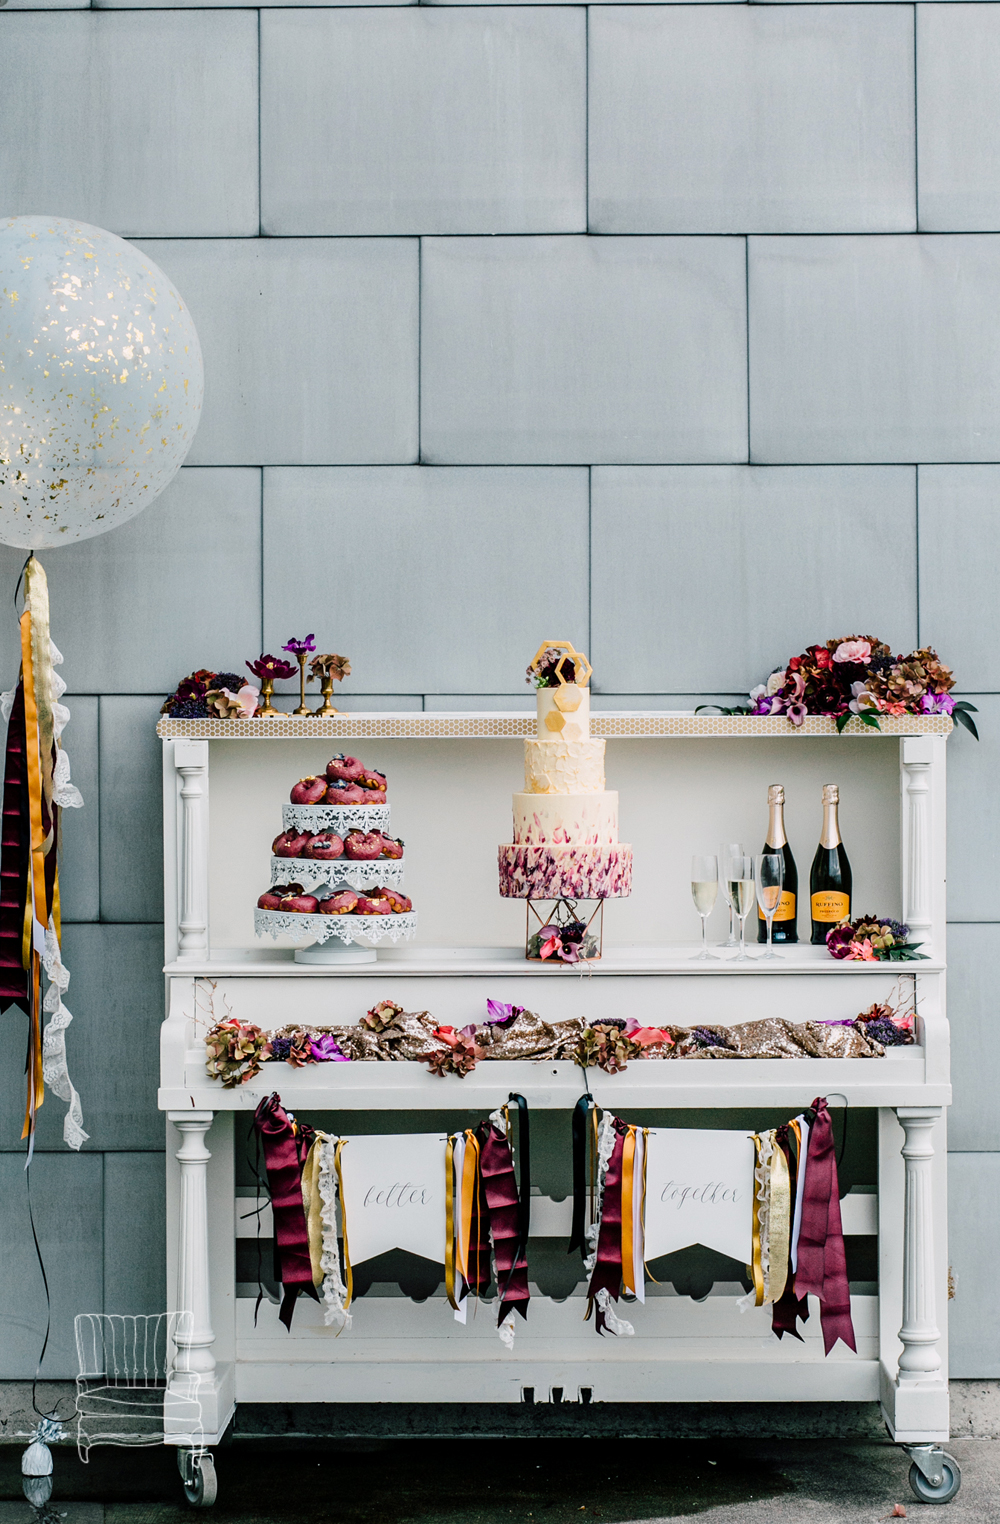 020-bellingham-wedding-photographer-katheryn-moran-bellwether-hotel-glitz-glam-styled-2016.jpg